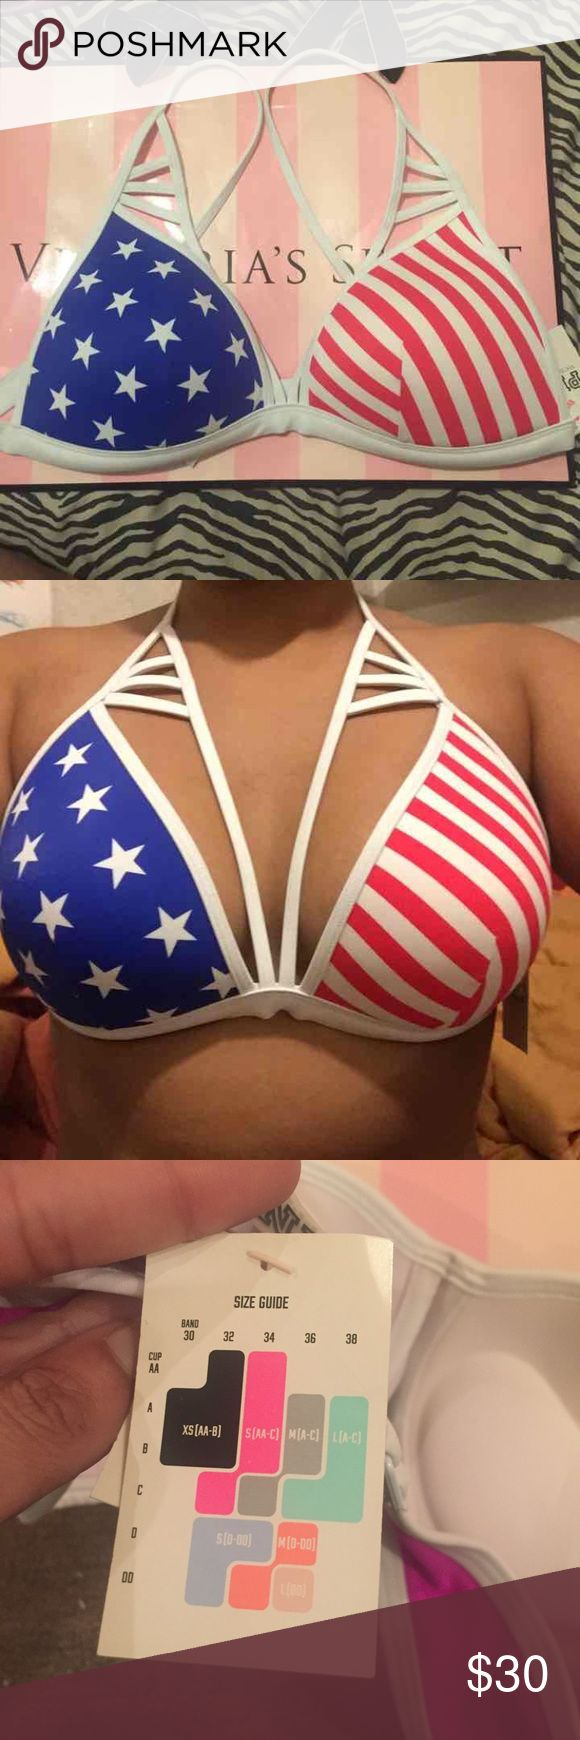 Vs pink American flag bikini top Victoria's Secret pink American flag strappy bikini top 34aa, 34a, 34b, 32c PINK Victoria's Secret Swim Bikinis